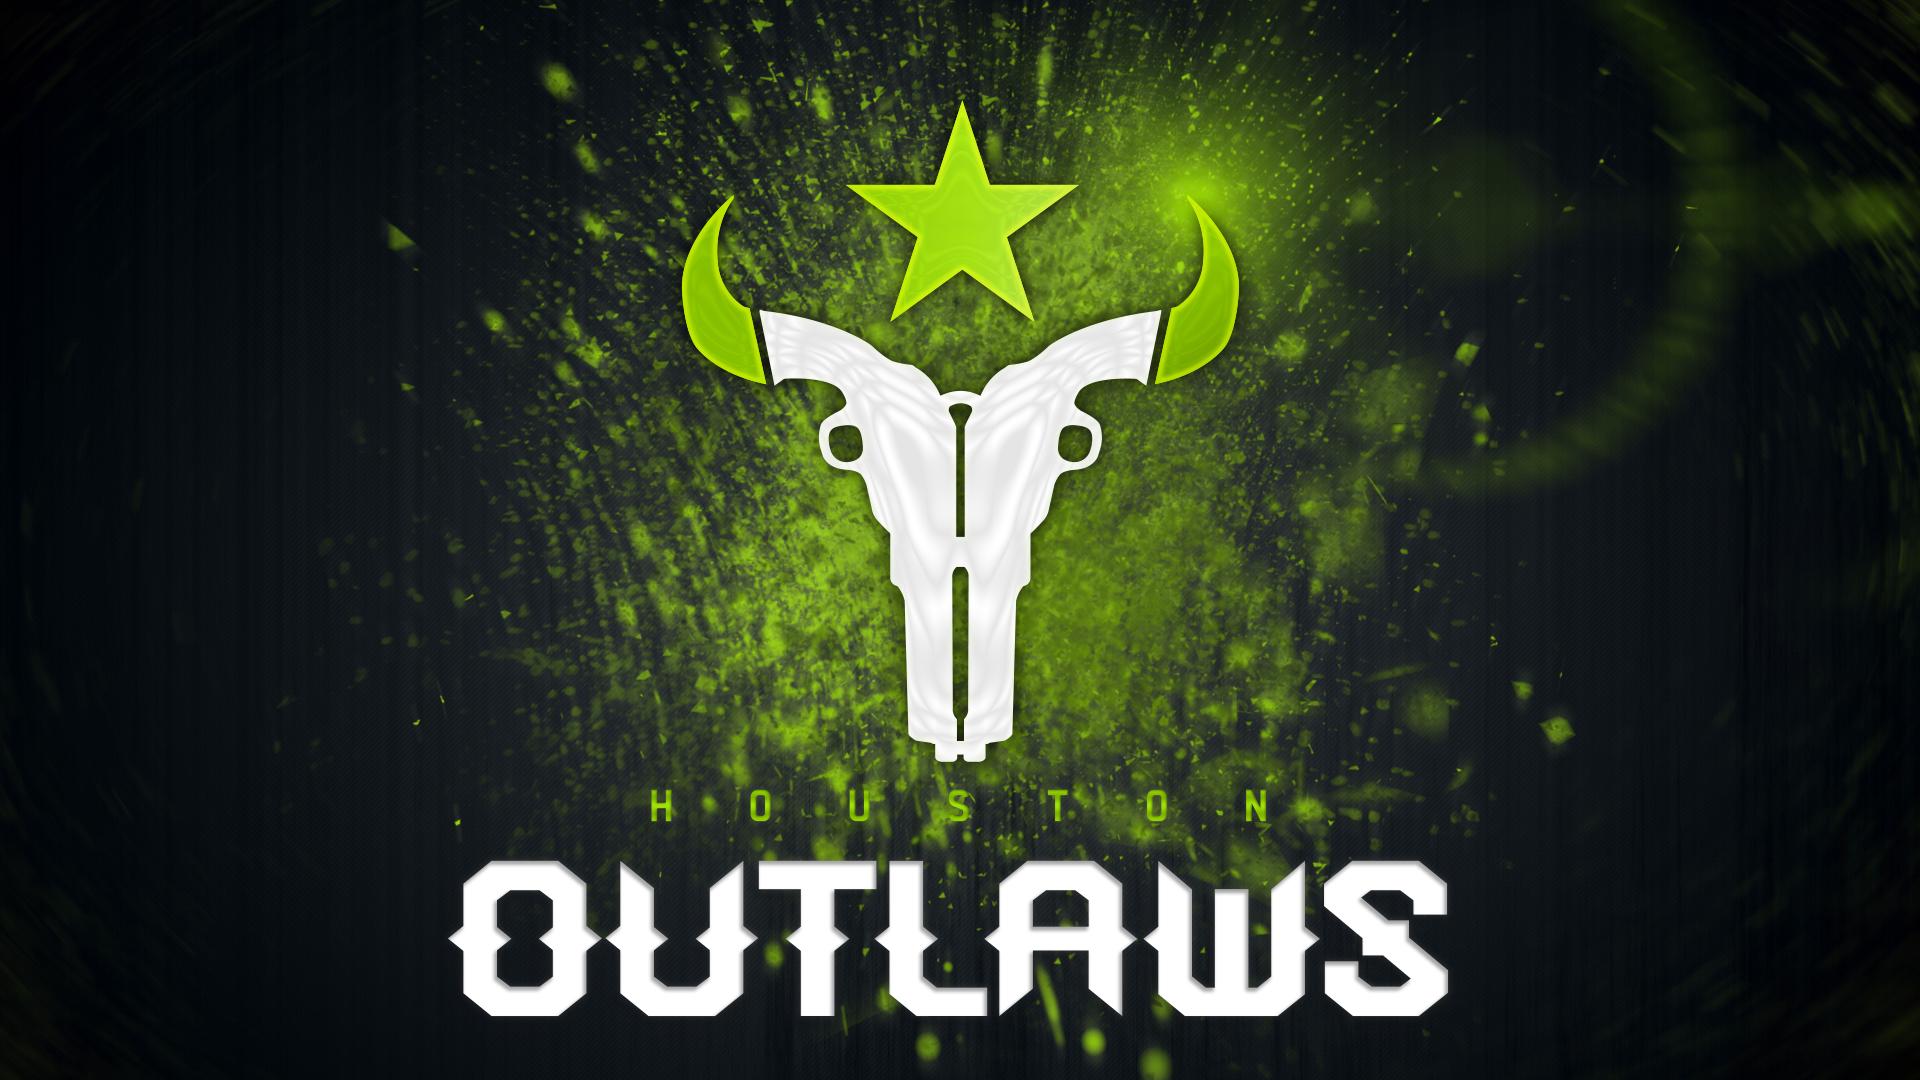 Wallpaper Overwatch League Houston Outlaws E Sports 1920x1080